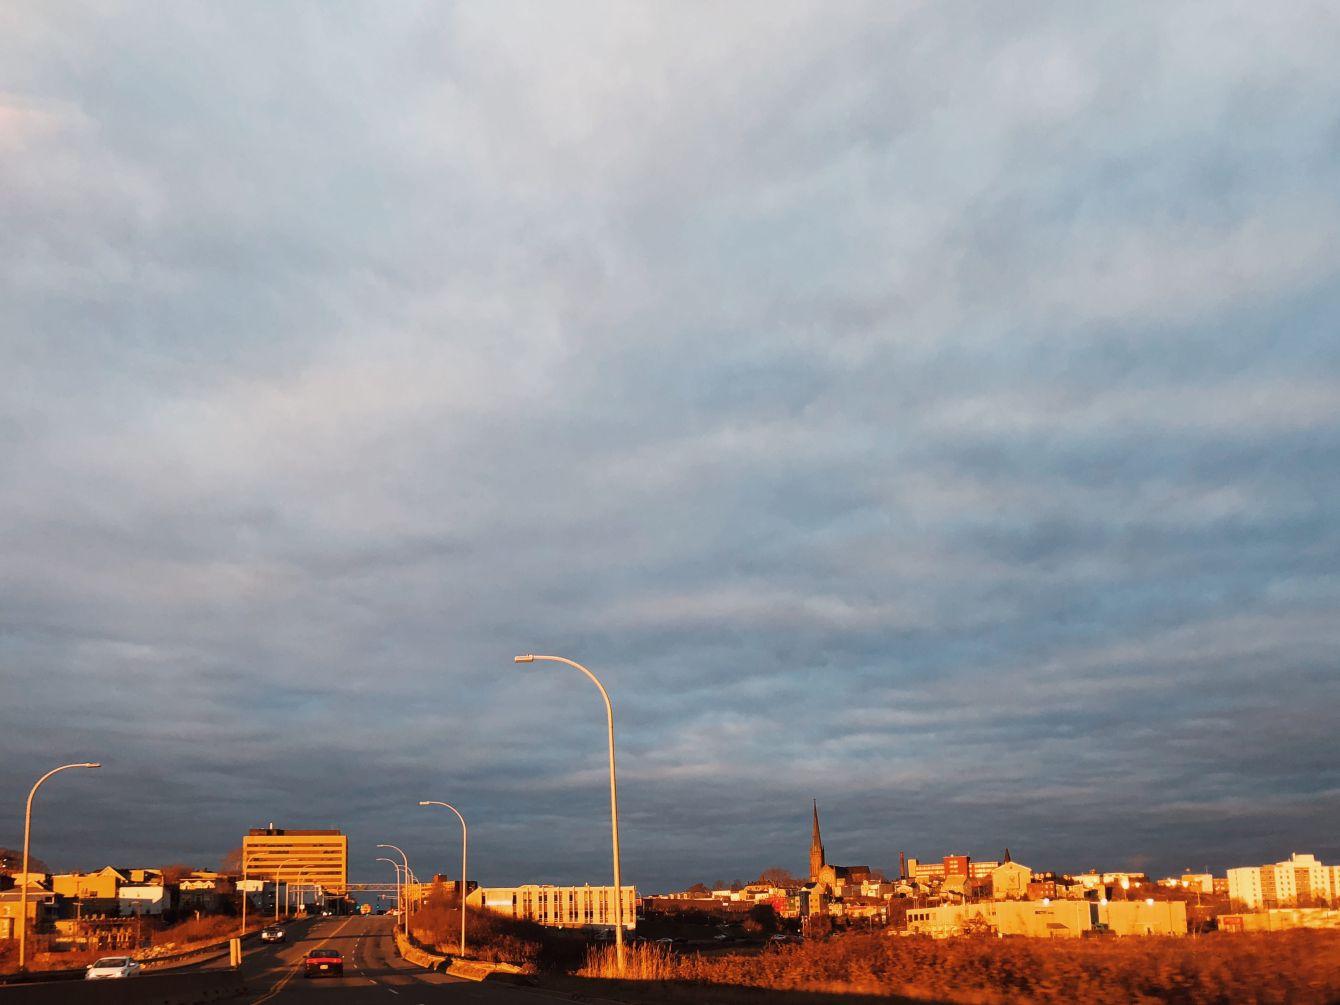 Click thumbnail to see details about photo - Saint John Causeway Golden Hour Photograph